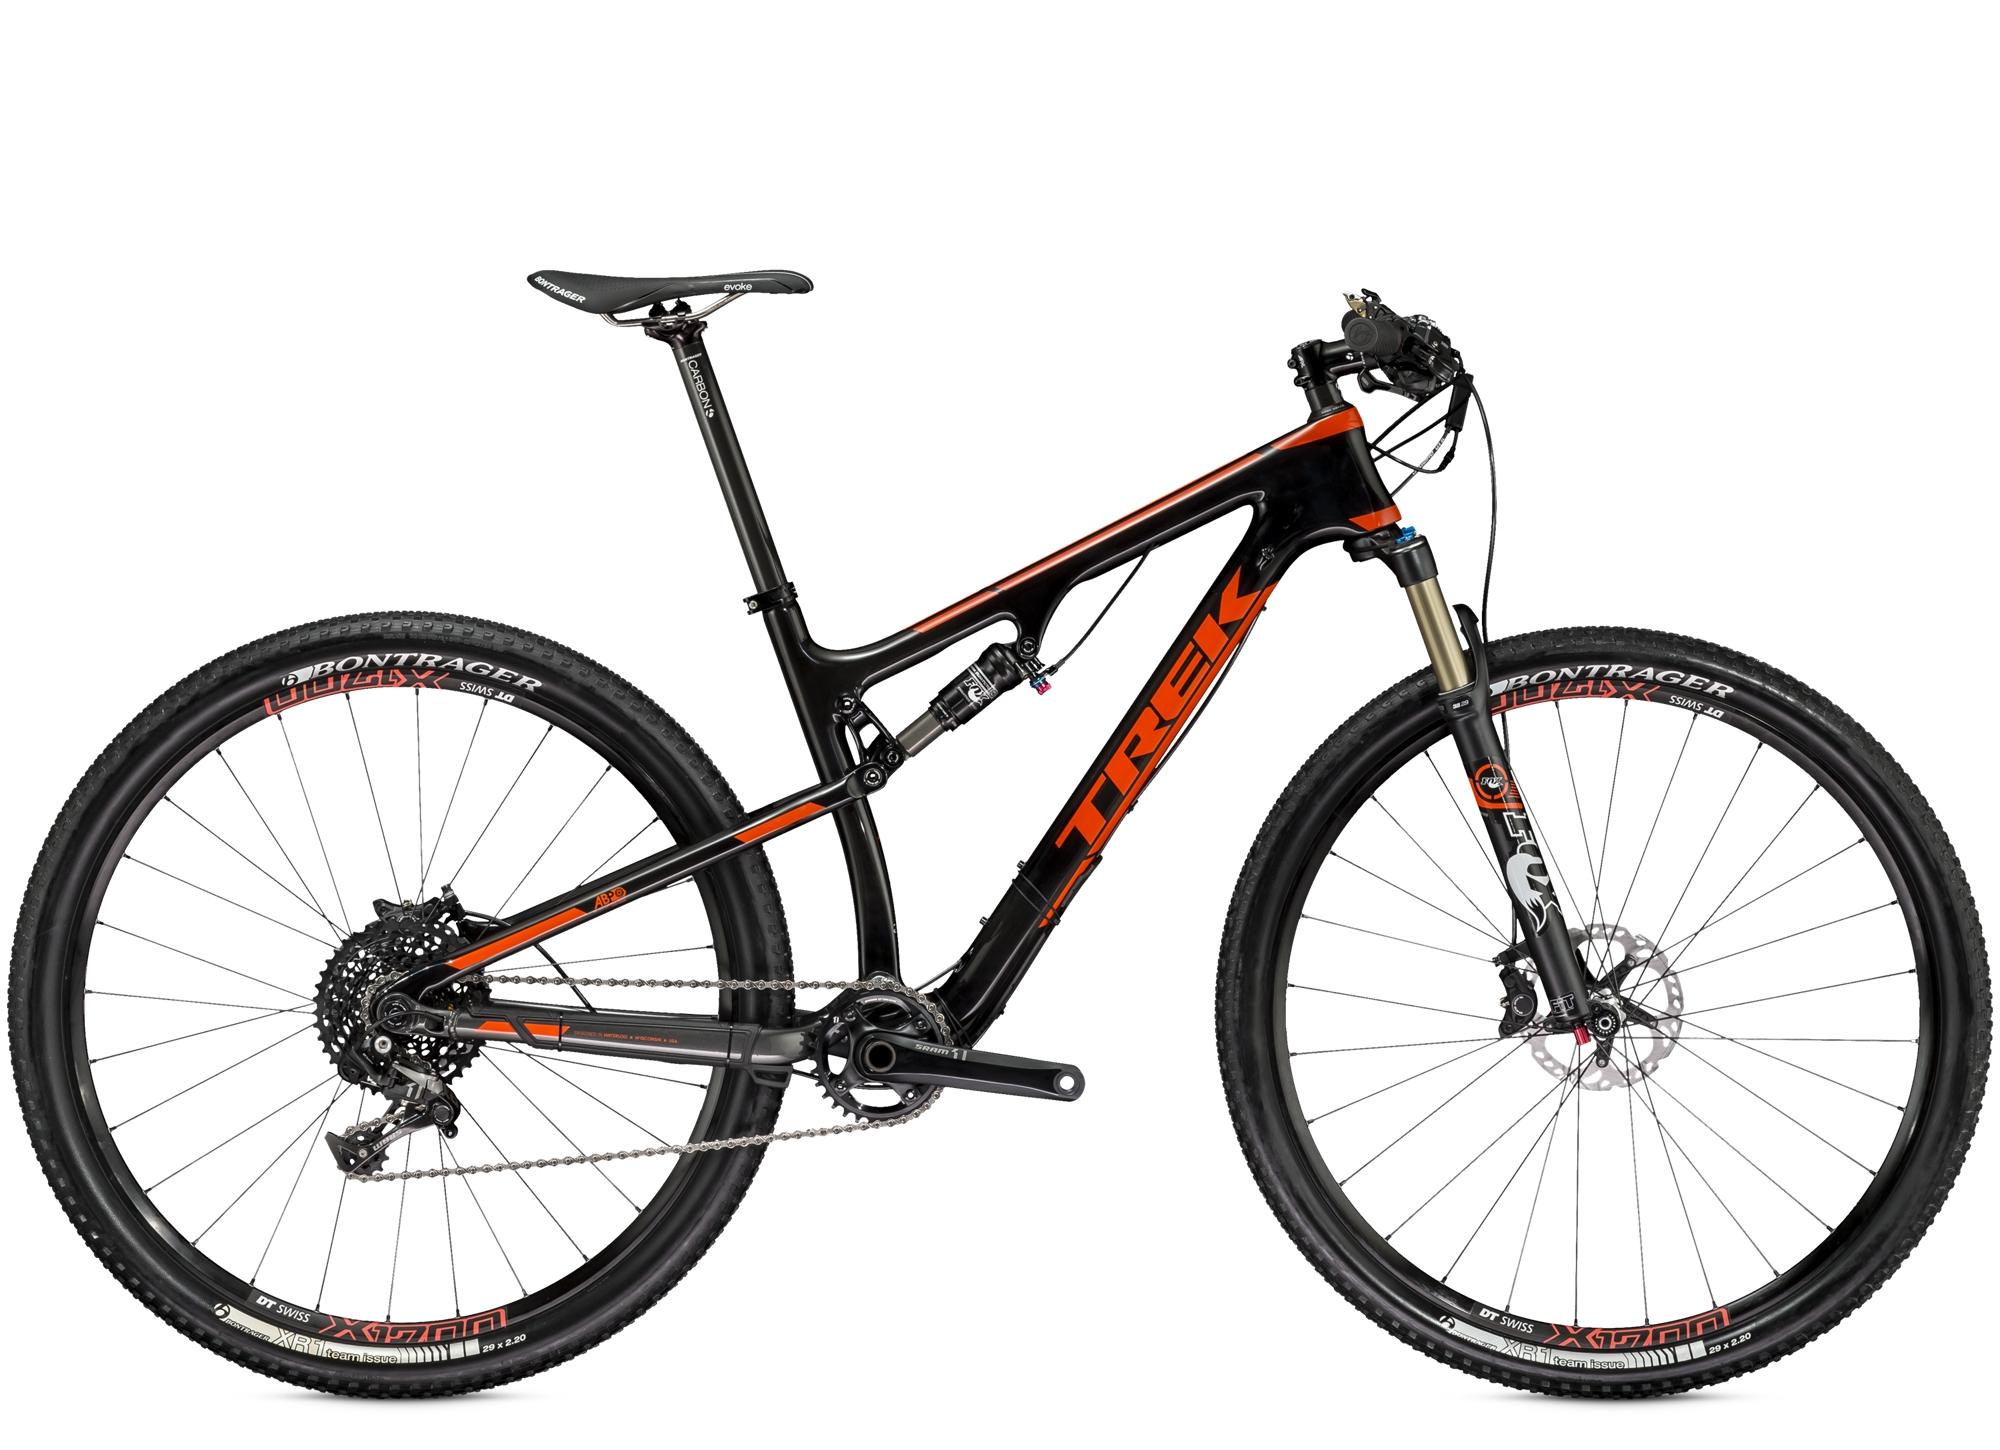 46f36384719 Trek Superfly FS 9.8 SL - Bicycling Experts-BikeGarage.com ...